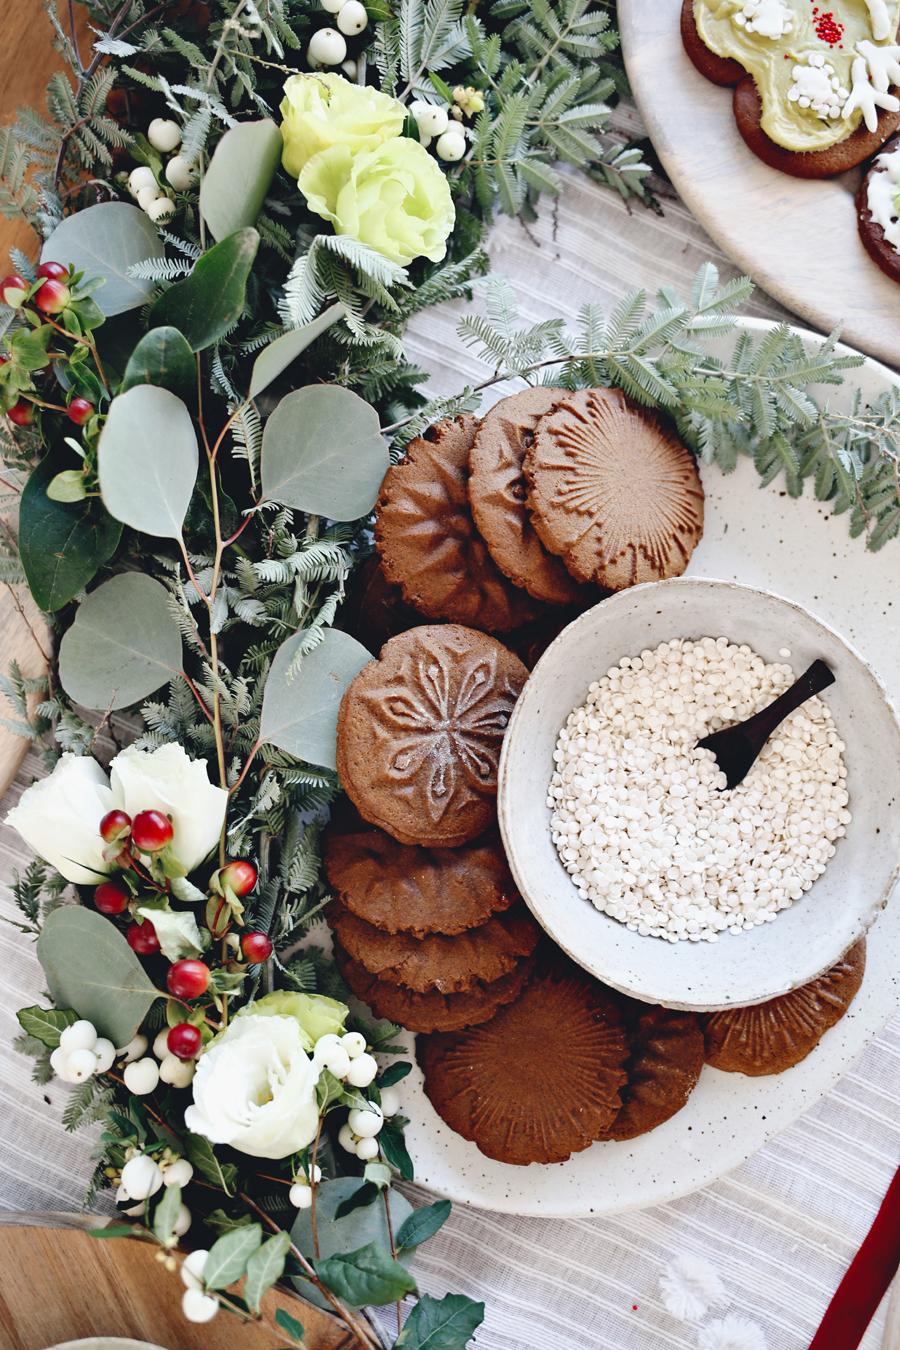 Cookie And Beer Pairing | Dine X Design